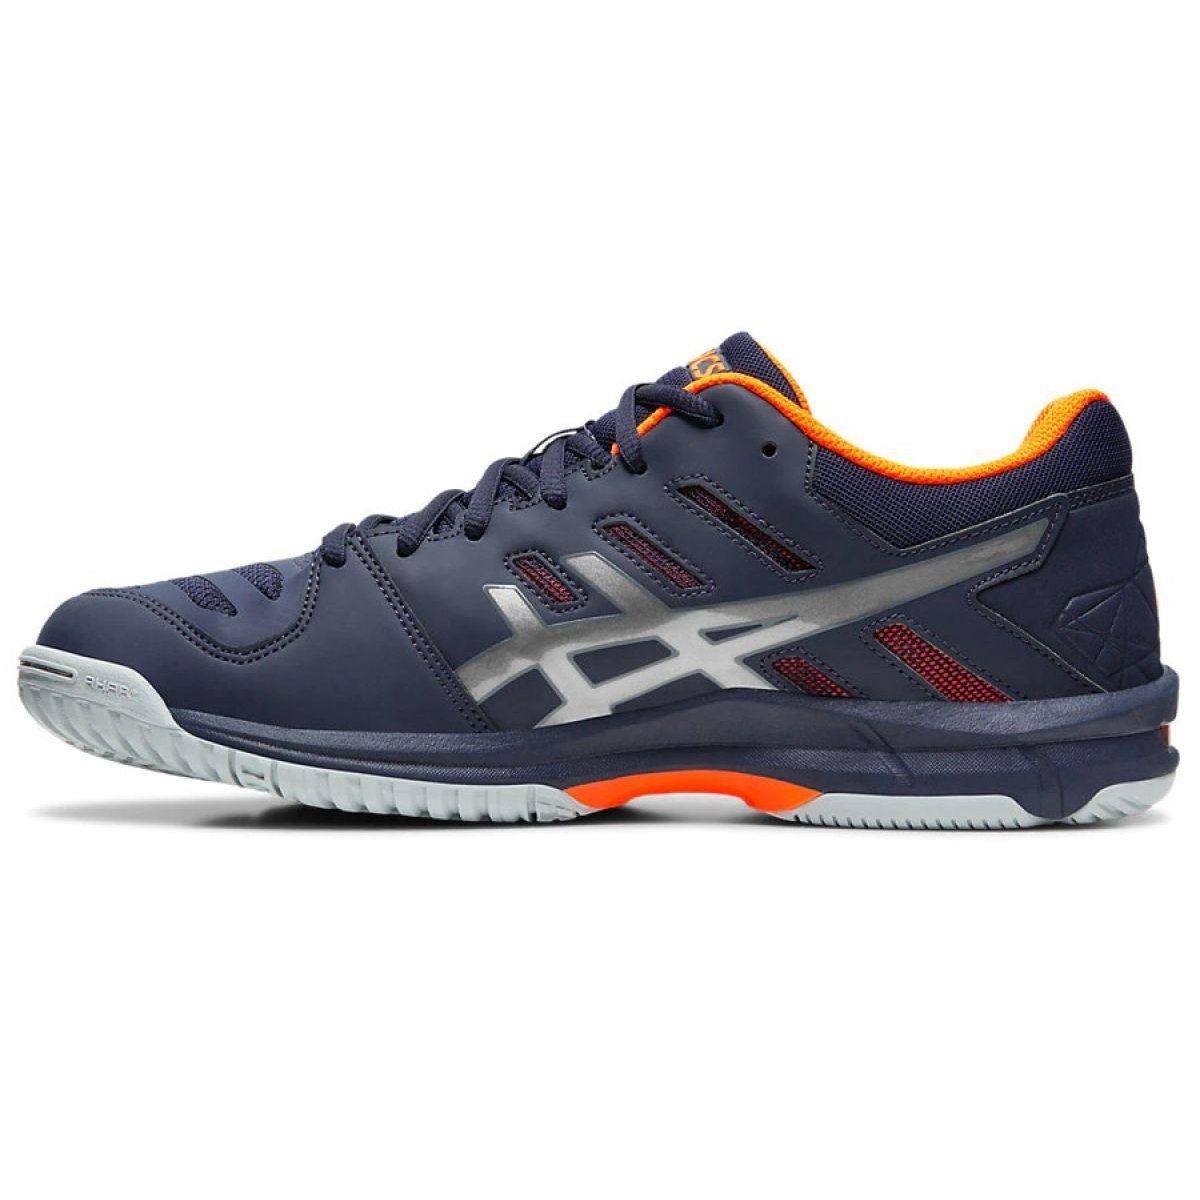 Buty Do Siatkowki Asics Gel Beyond 5 M B601n 402 Granatowe Wielokolorowe Asics Asics Gel Volleyball Shoes